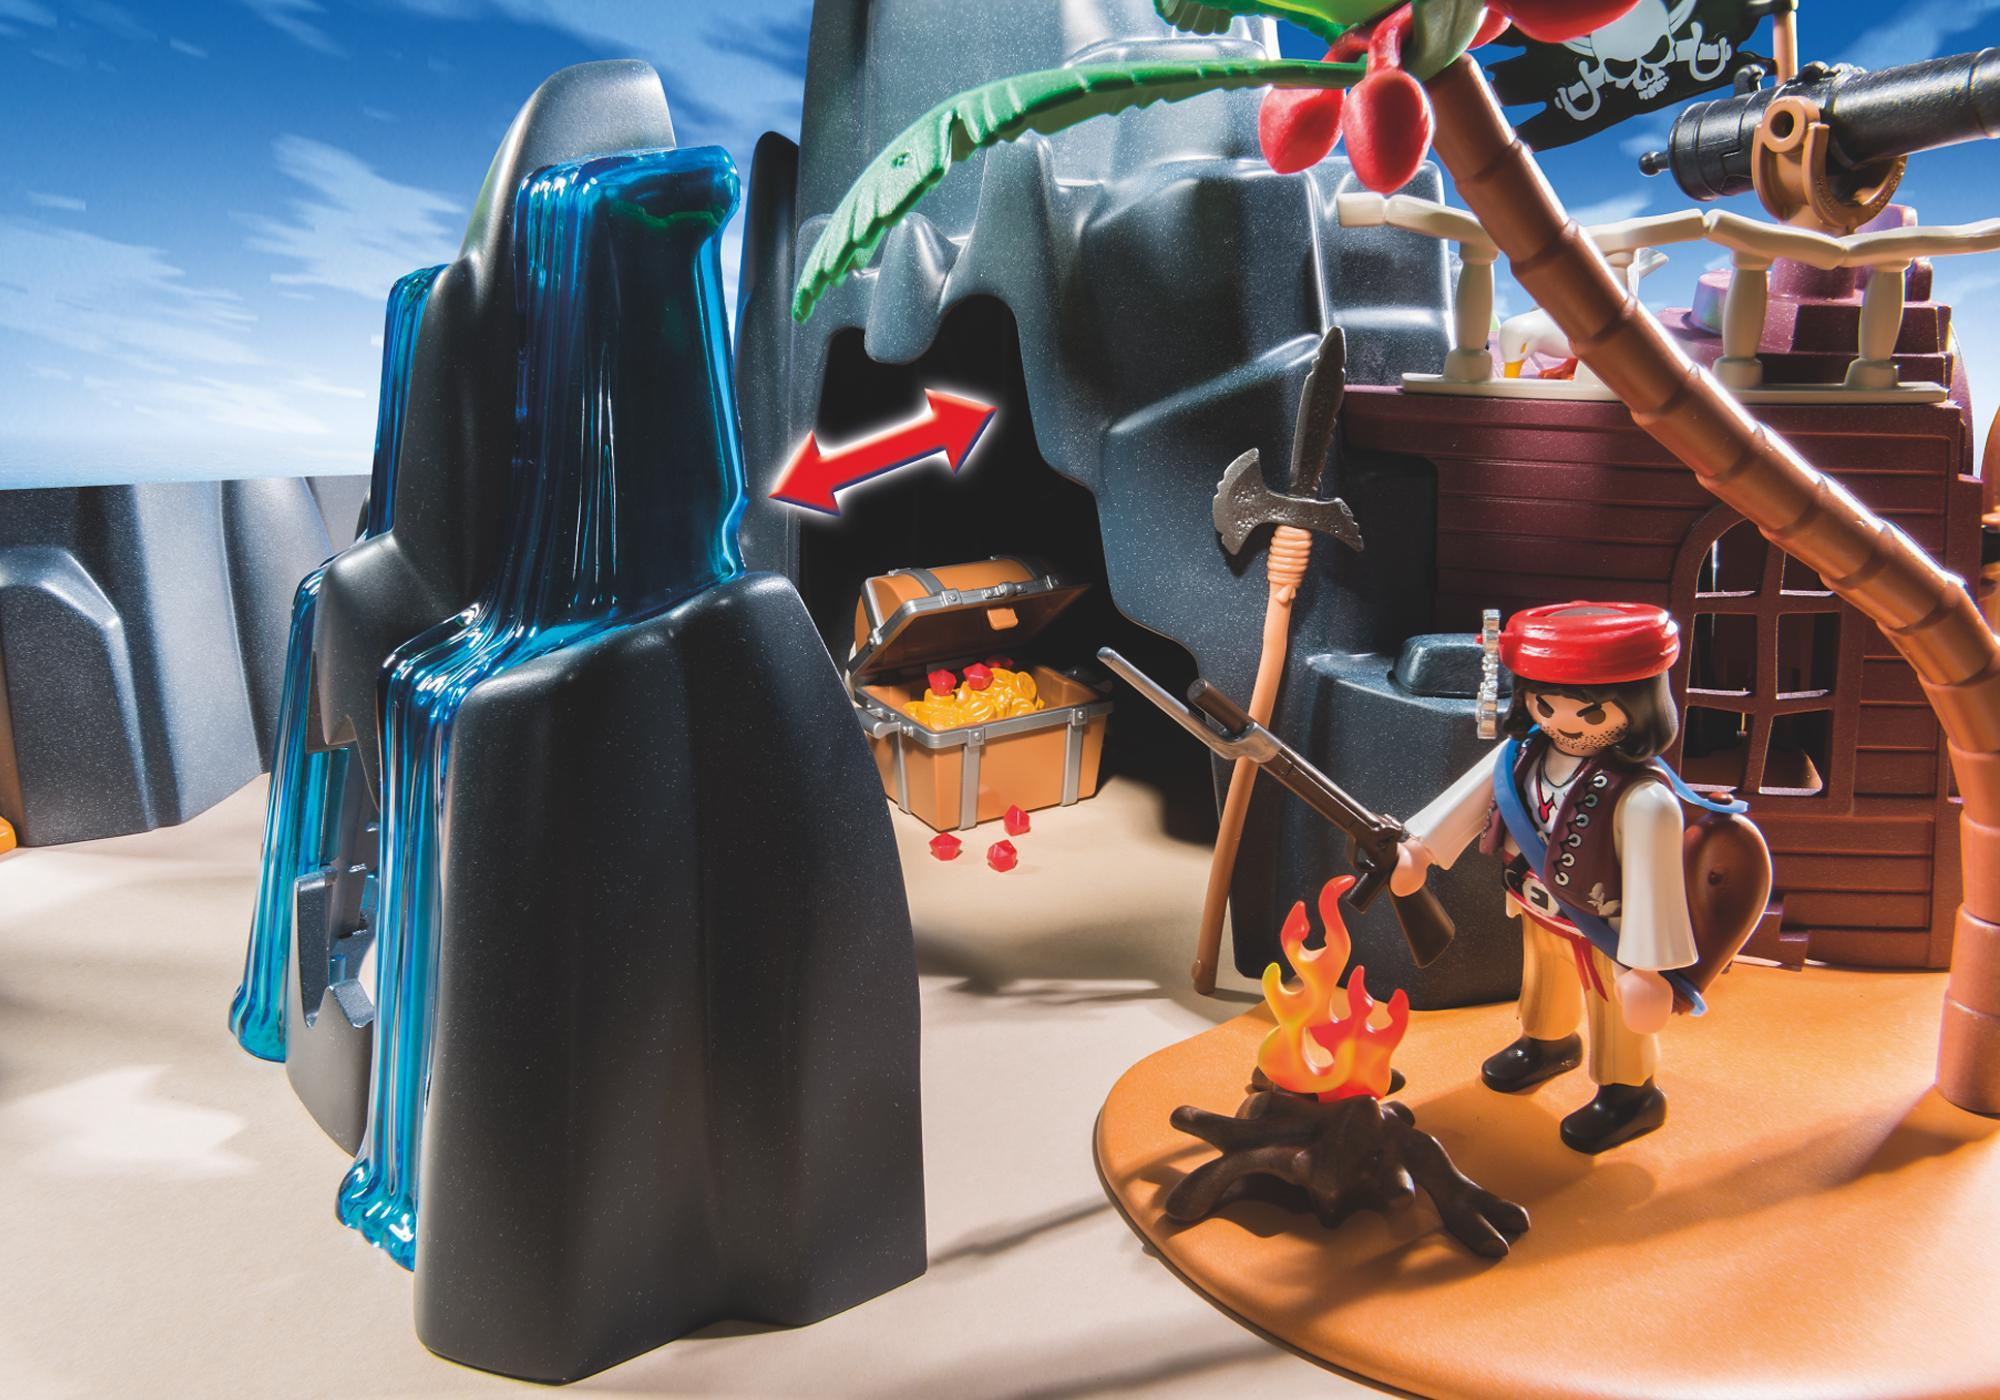 http://media.playmobil.com/i/playmobil/6679_product_extra1/Isola del tesoro fortificata